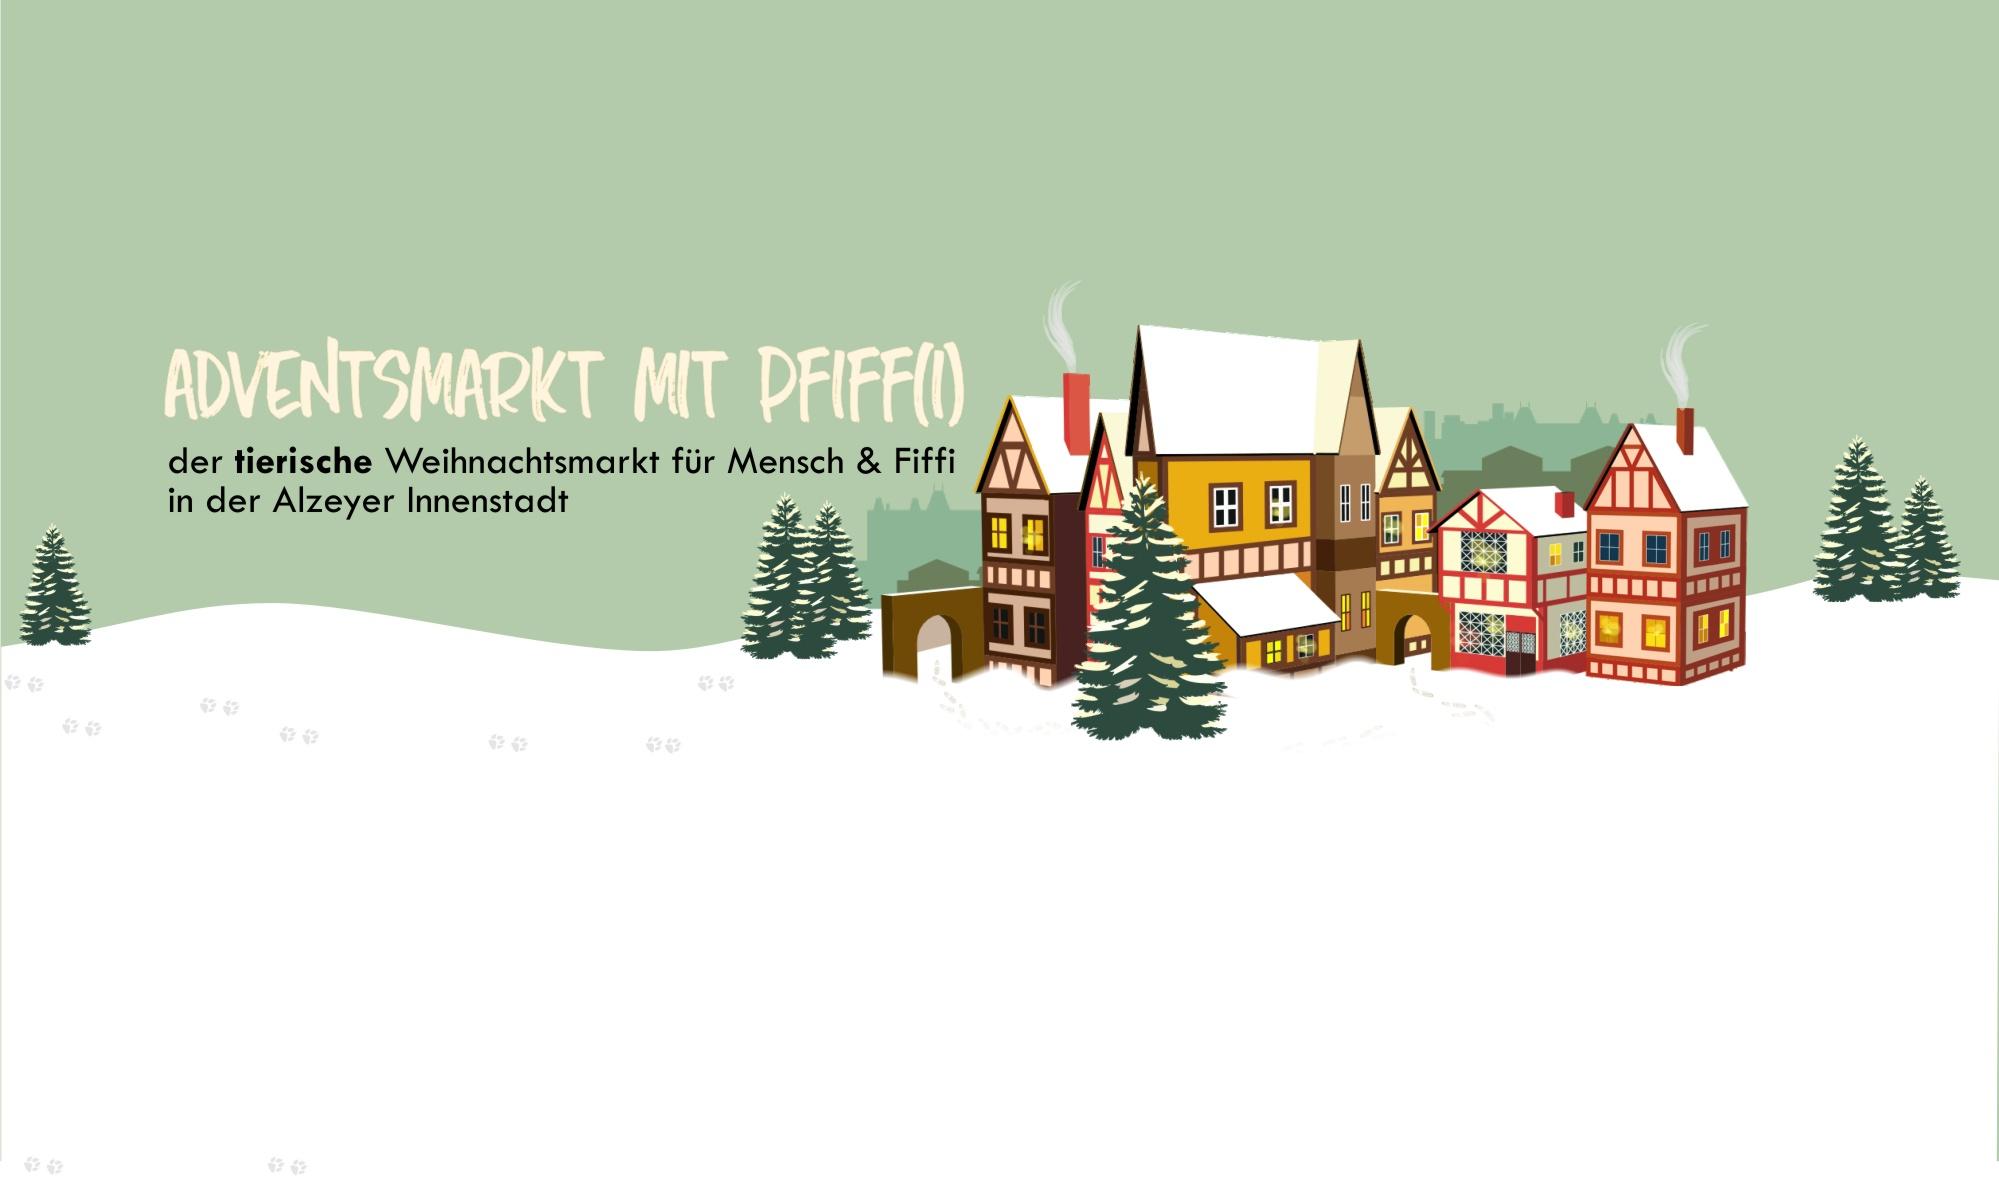 Adventsmarkt mit Pfiff(i)